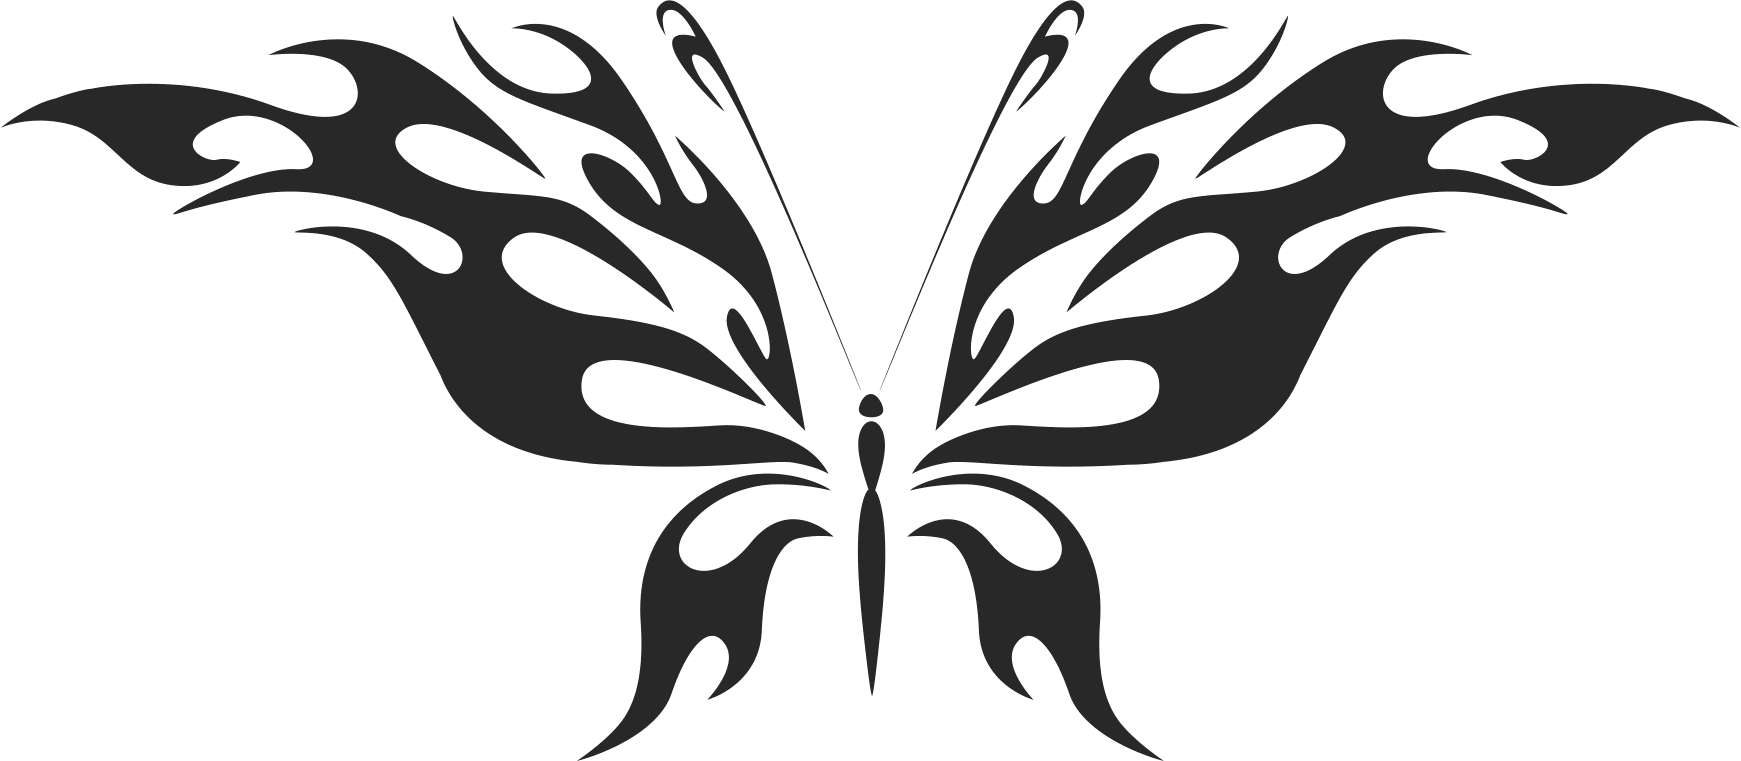 Butterfly Vector Art 045 Free CDR Vectors Art